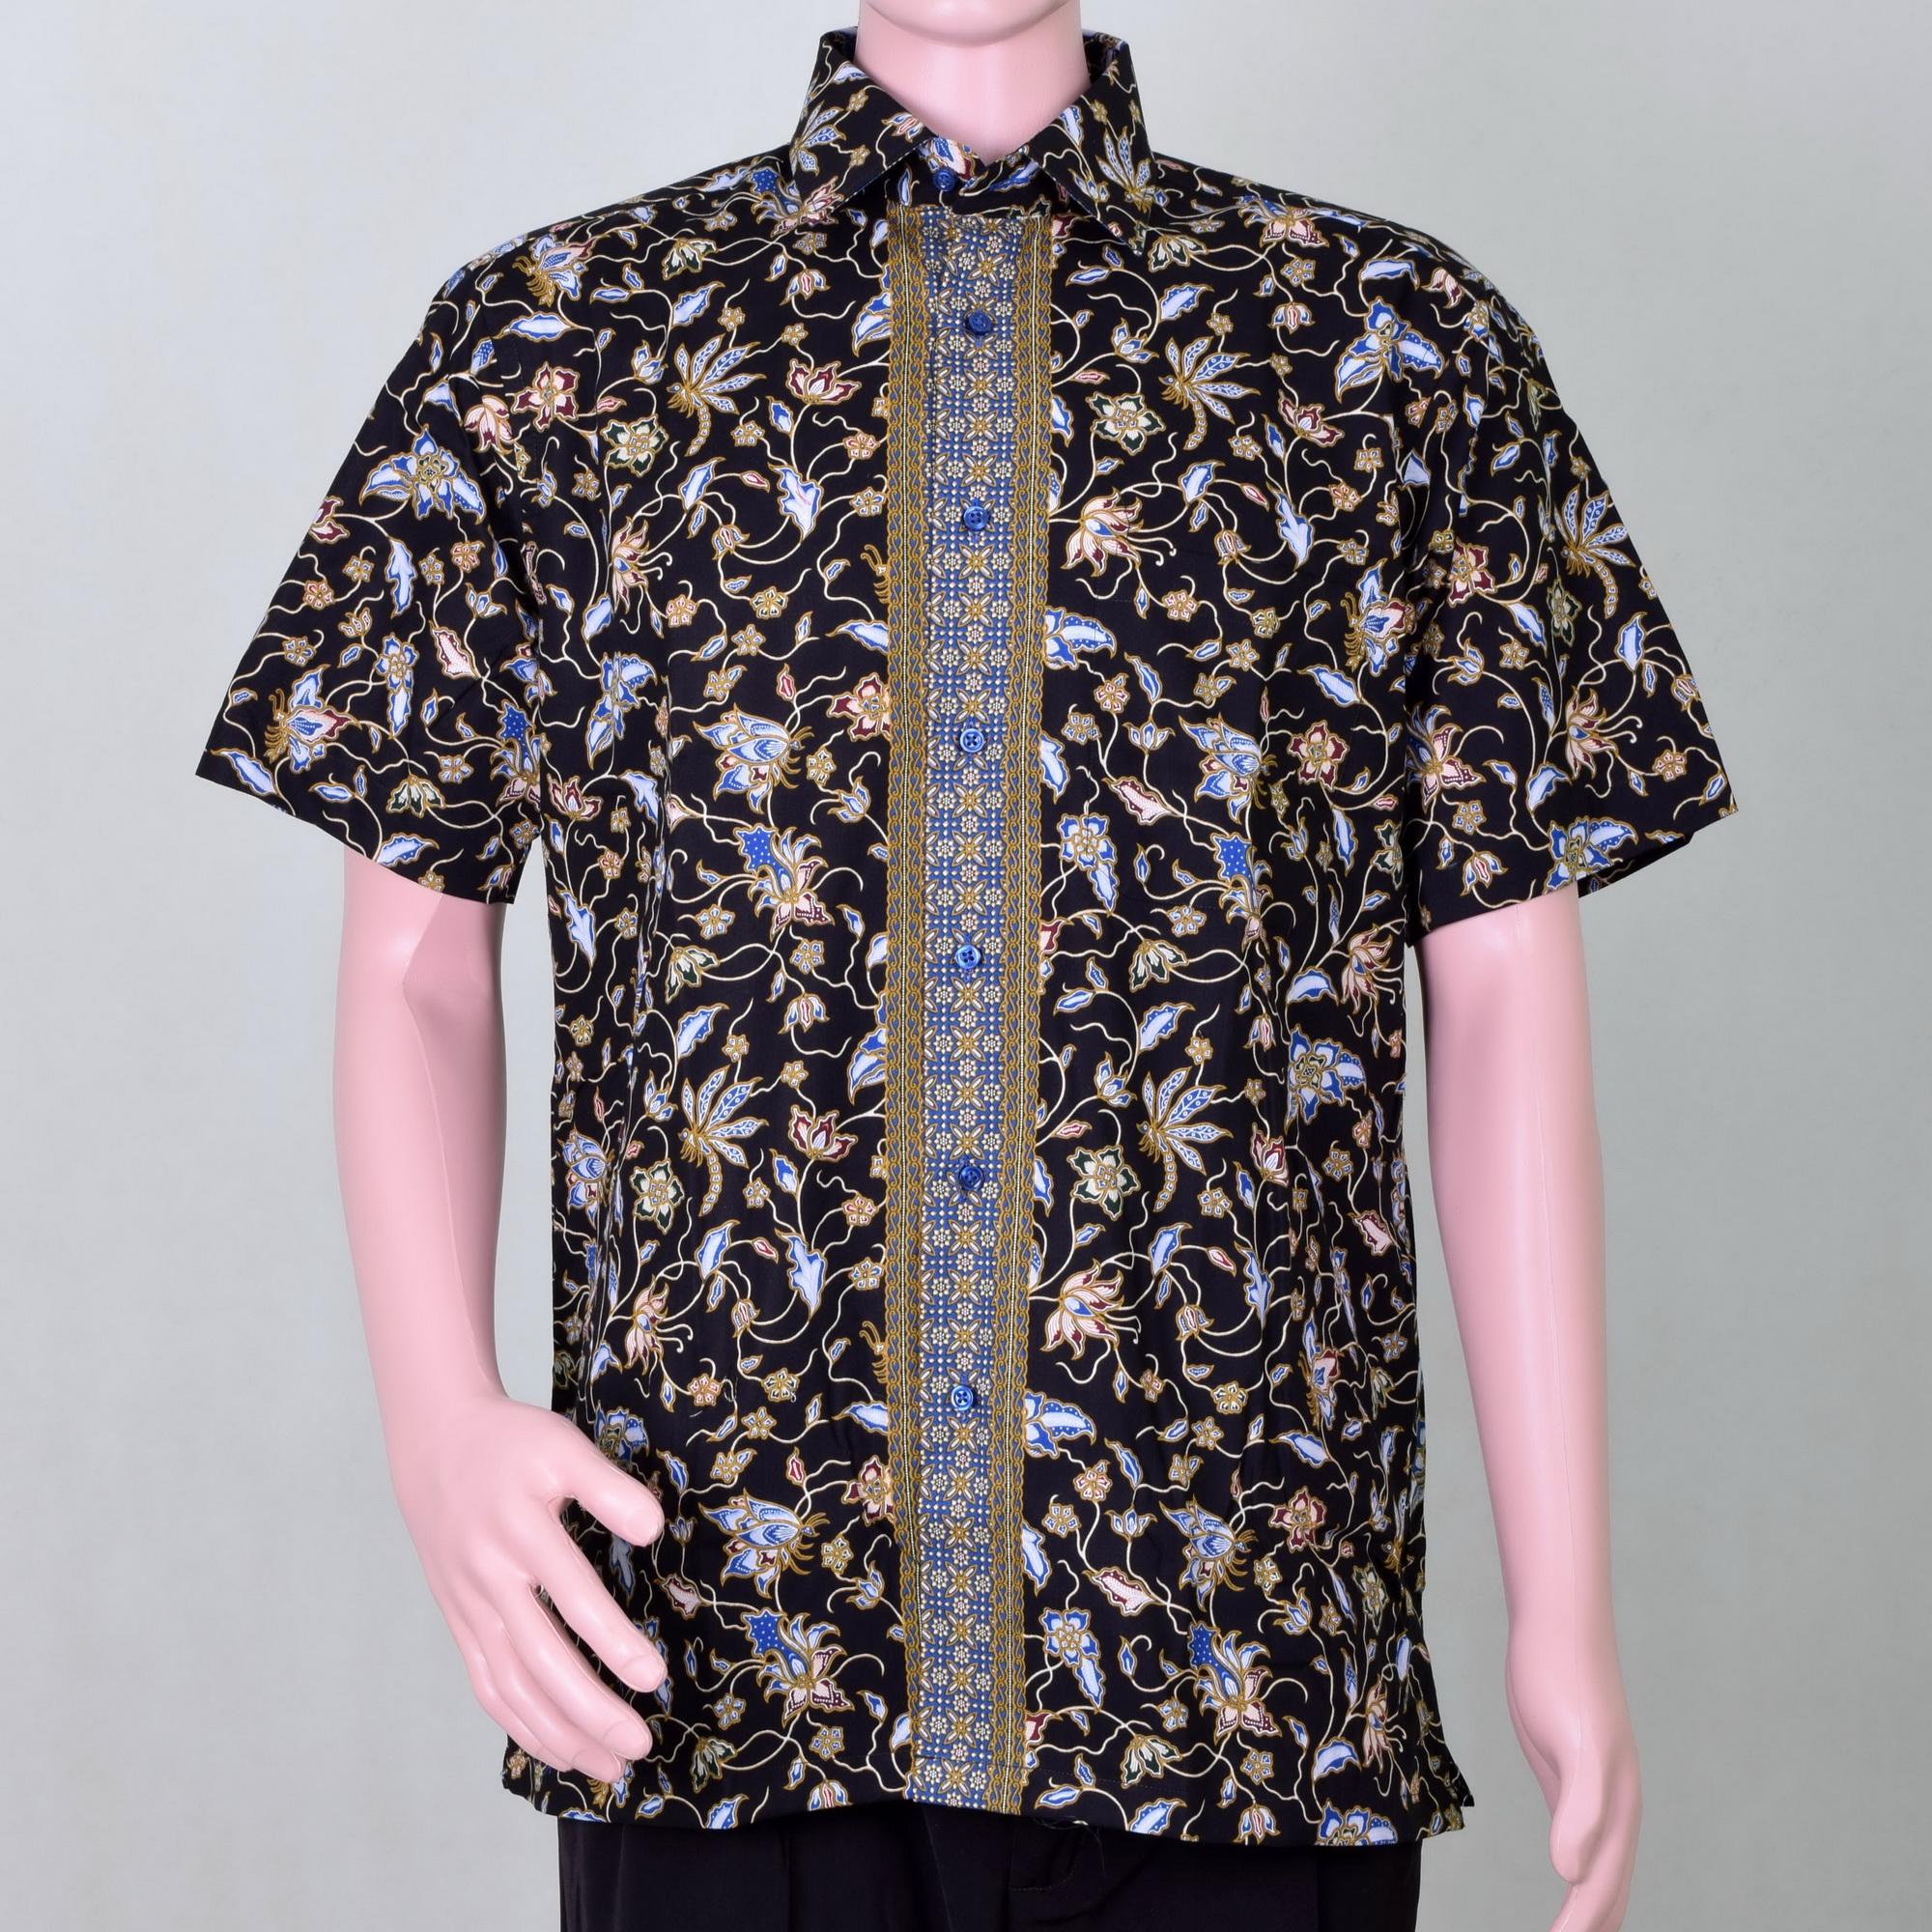 Alisan - Kemeja Batik Pendek - Hitam